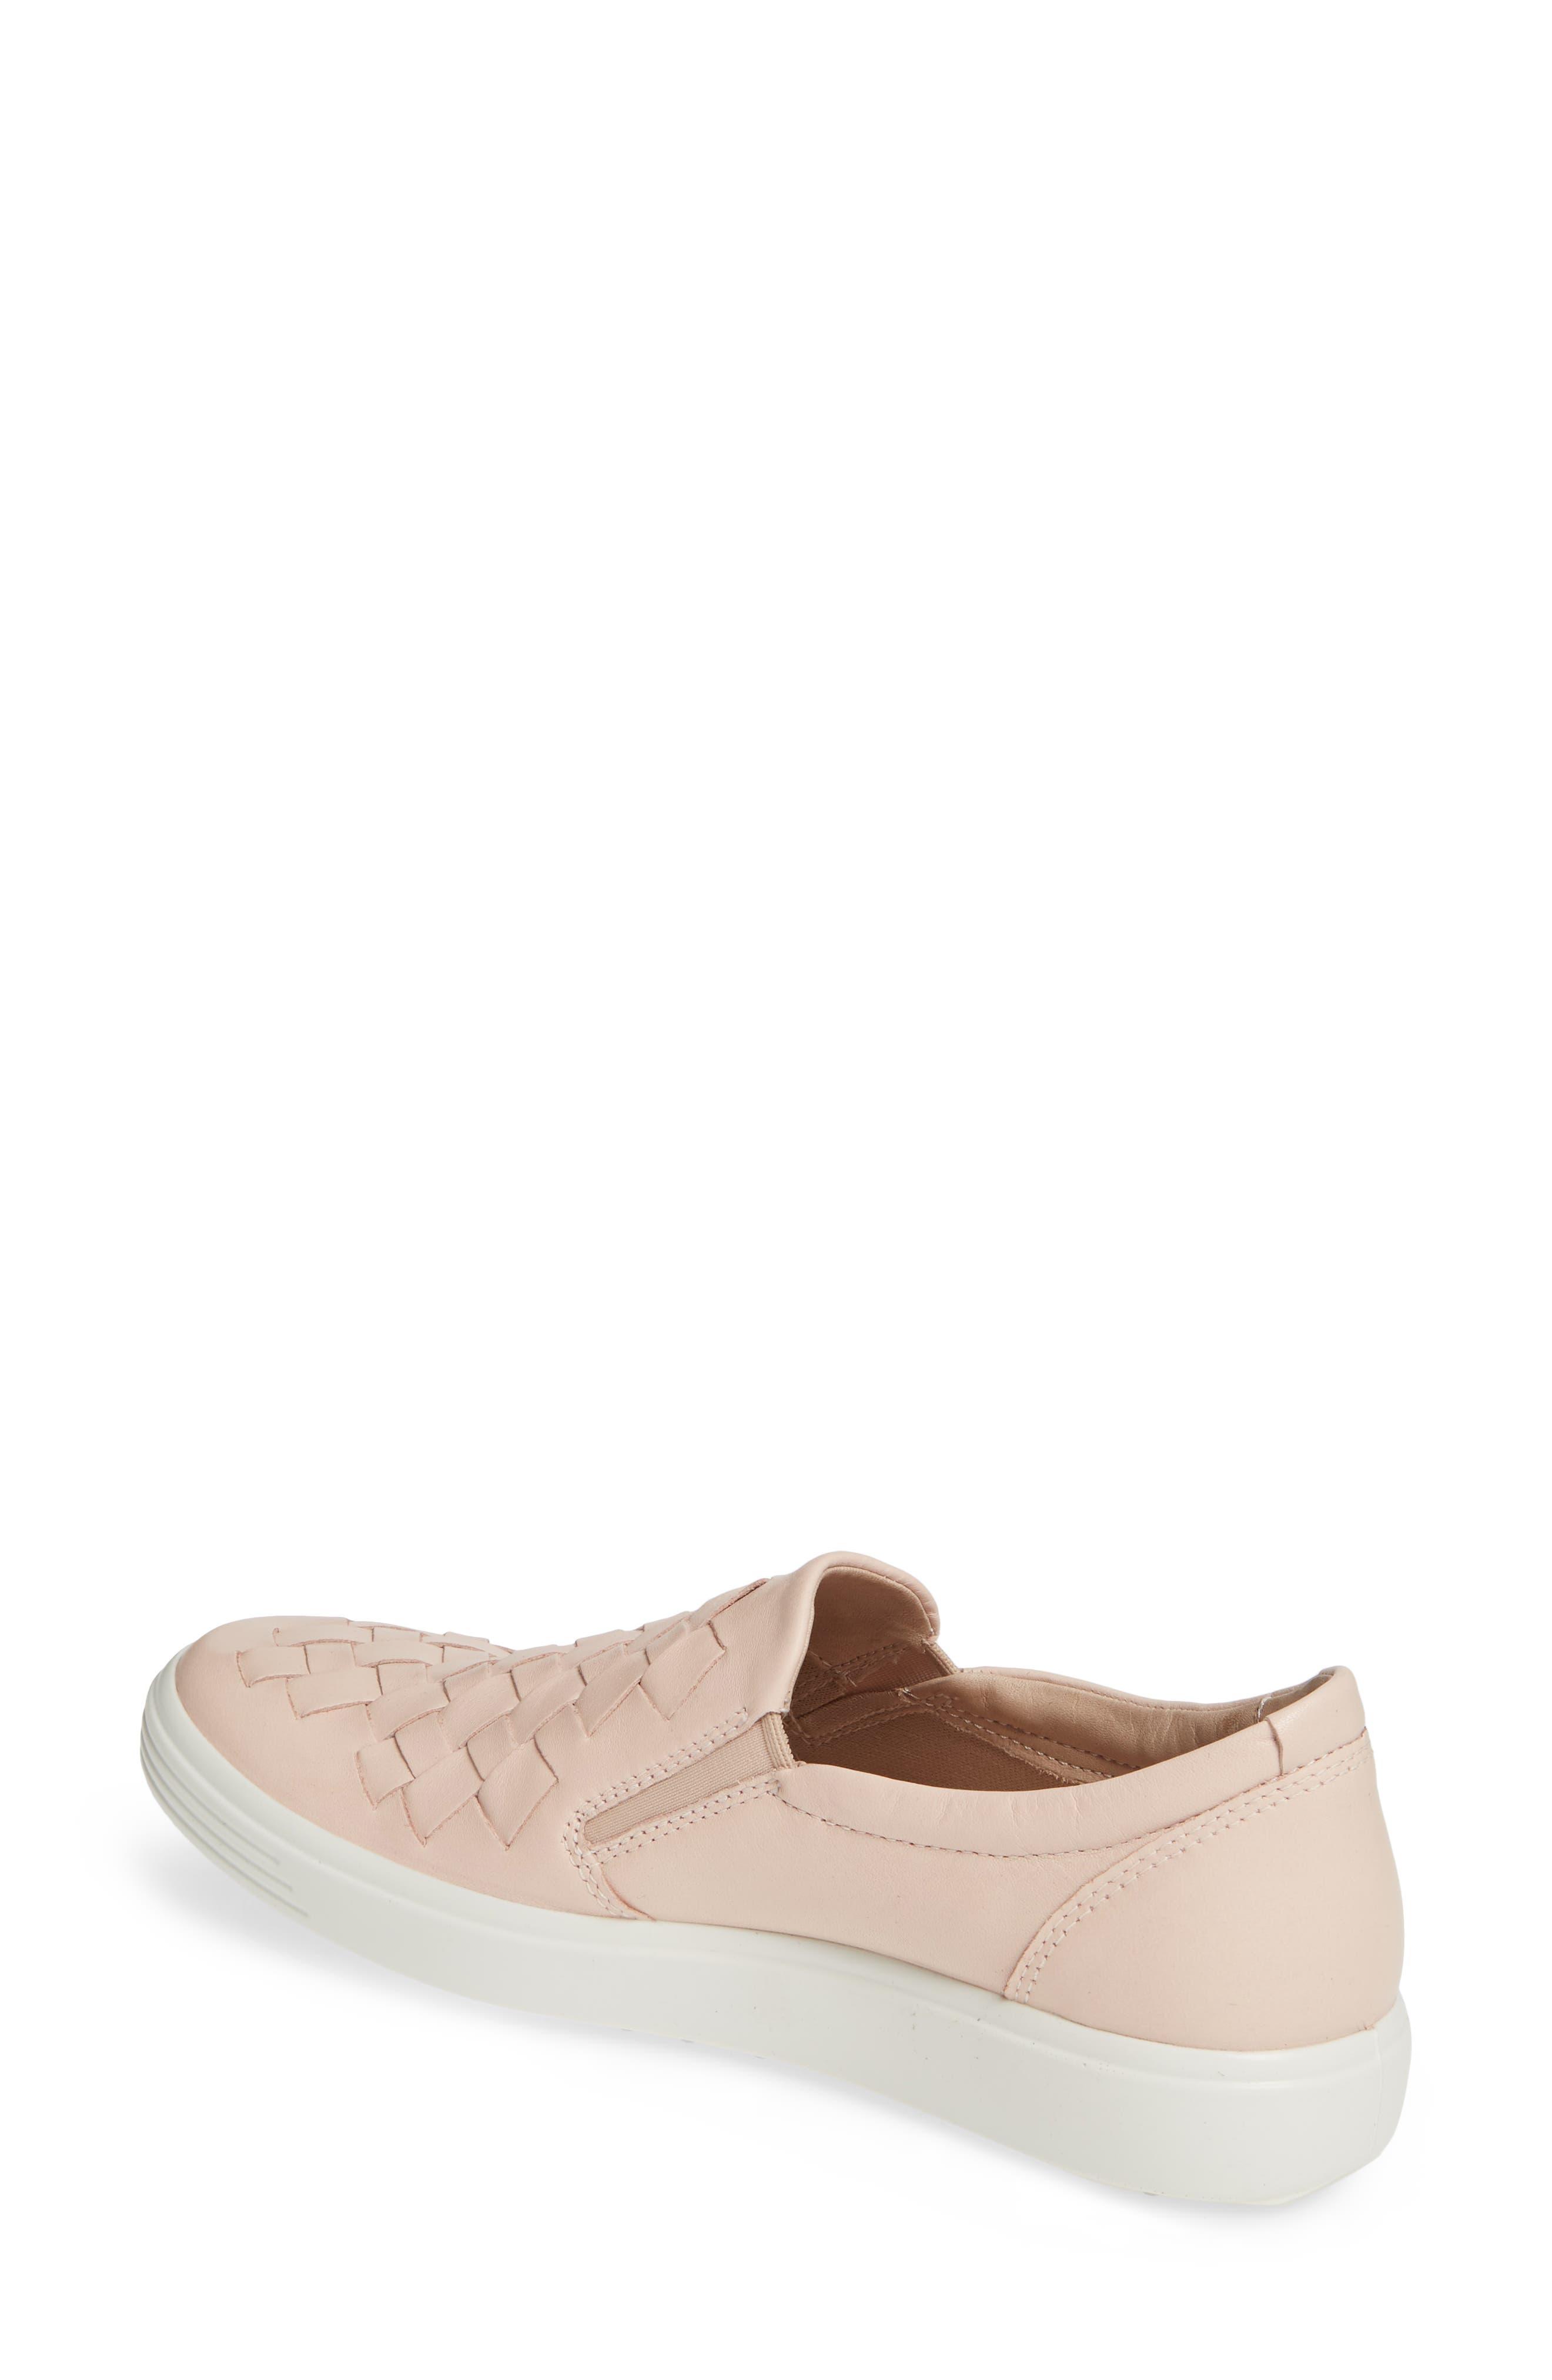 ECCO, Soft 7 Woven Slip-On Sneaker, Alternate thumbnail 2, color, ROSE DUST LEATHER